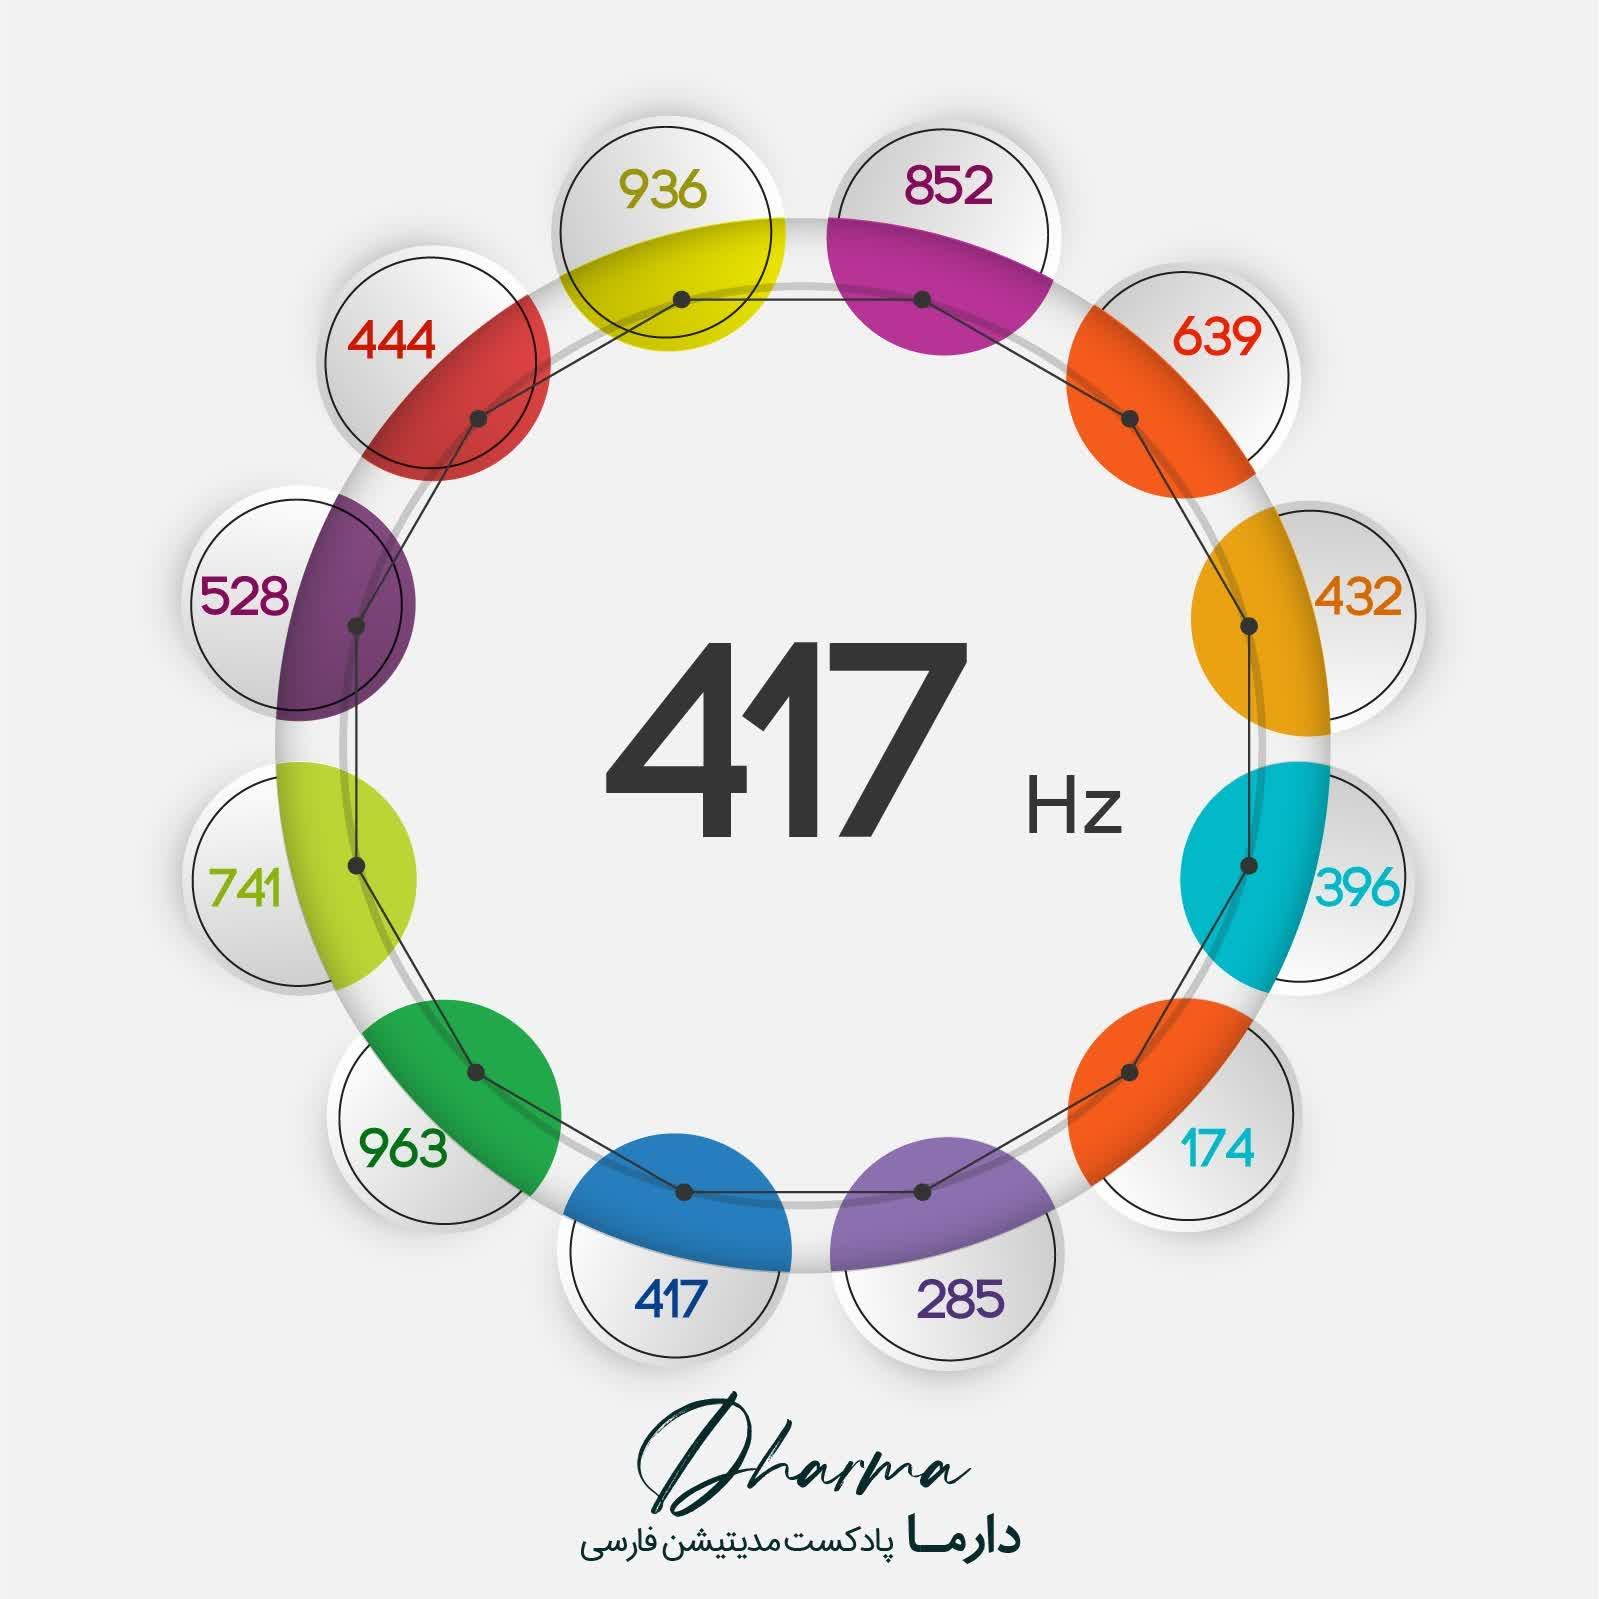 417Hz - فرکانس 417 هرتز